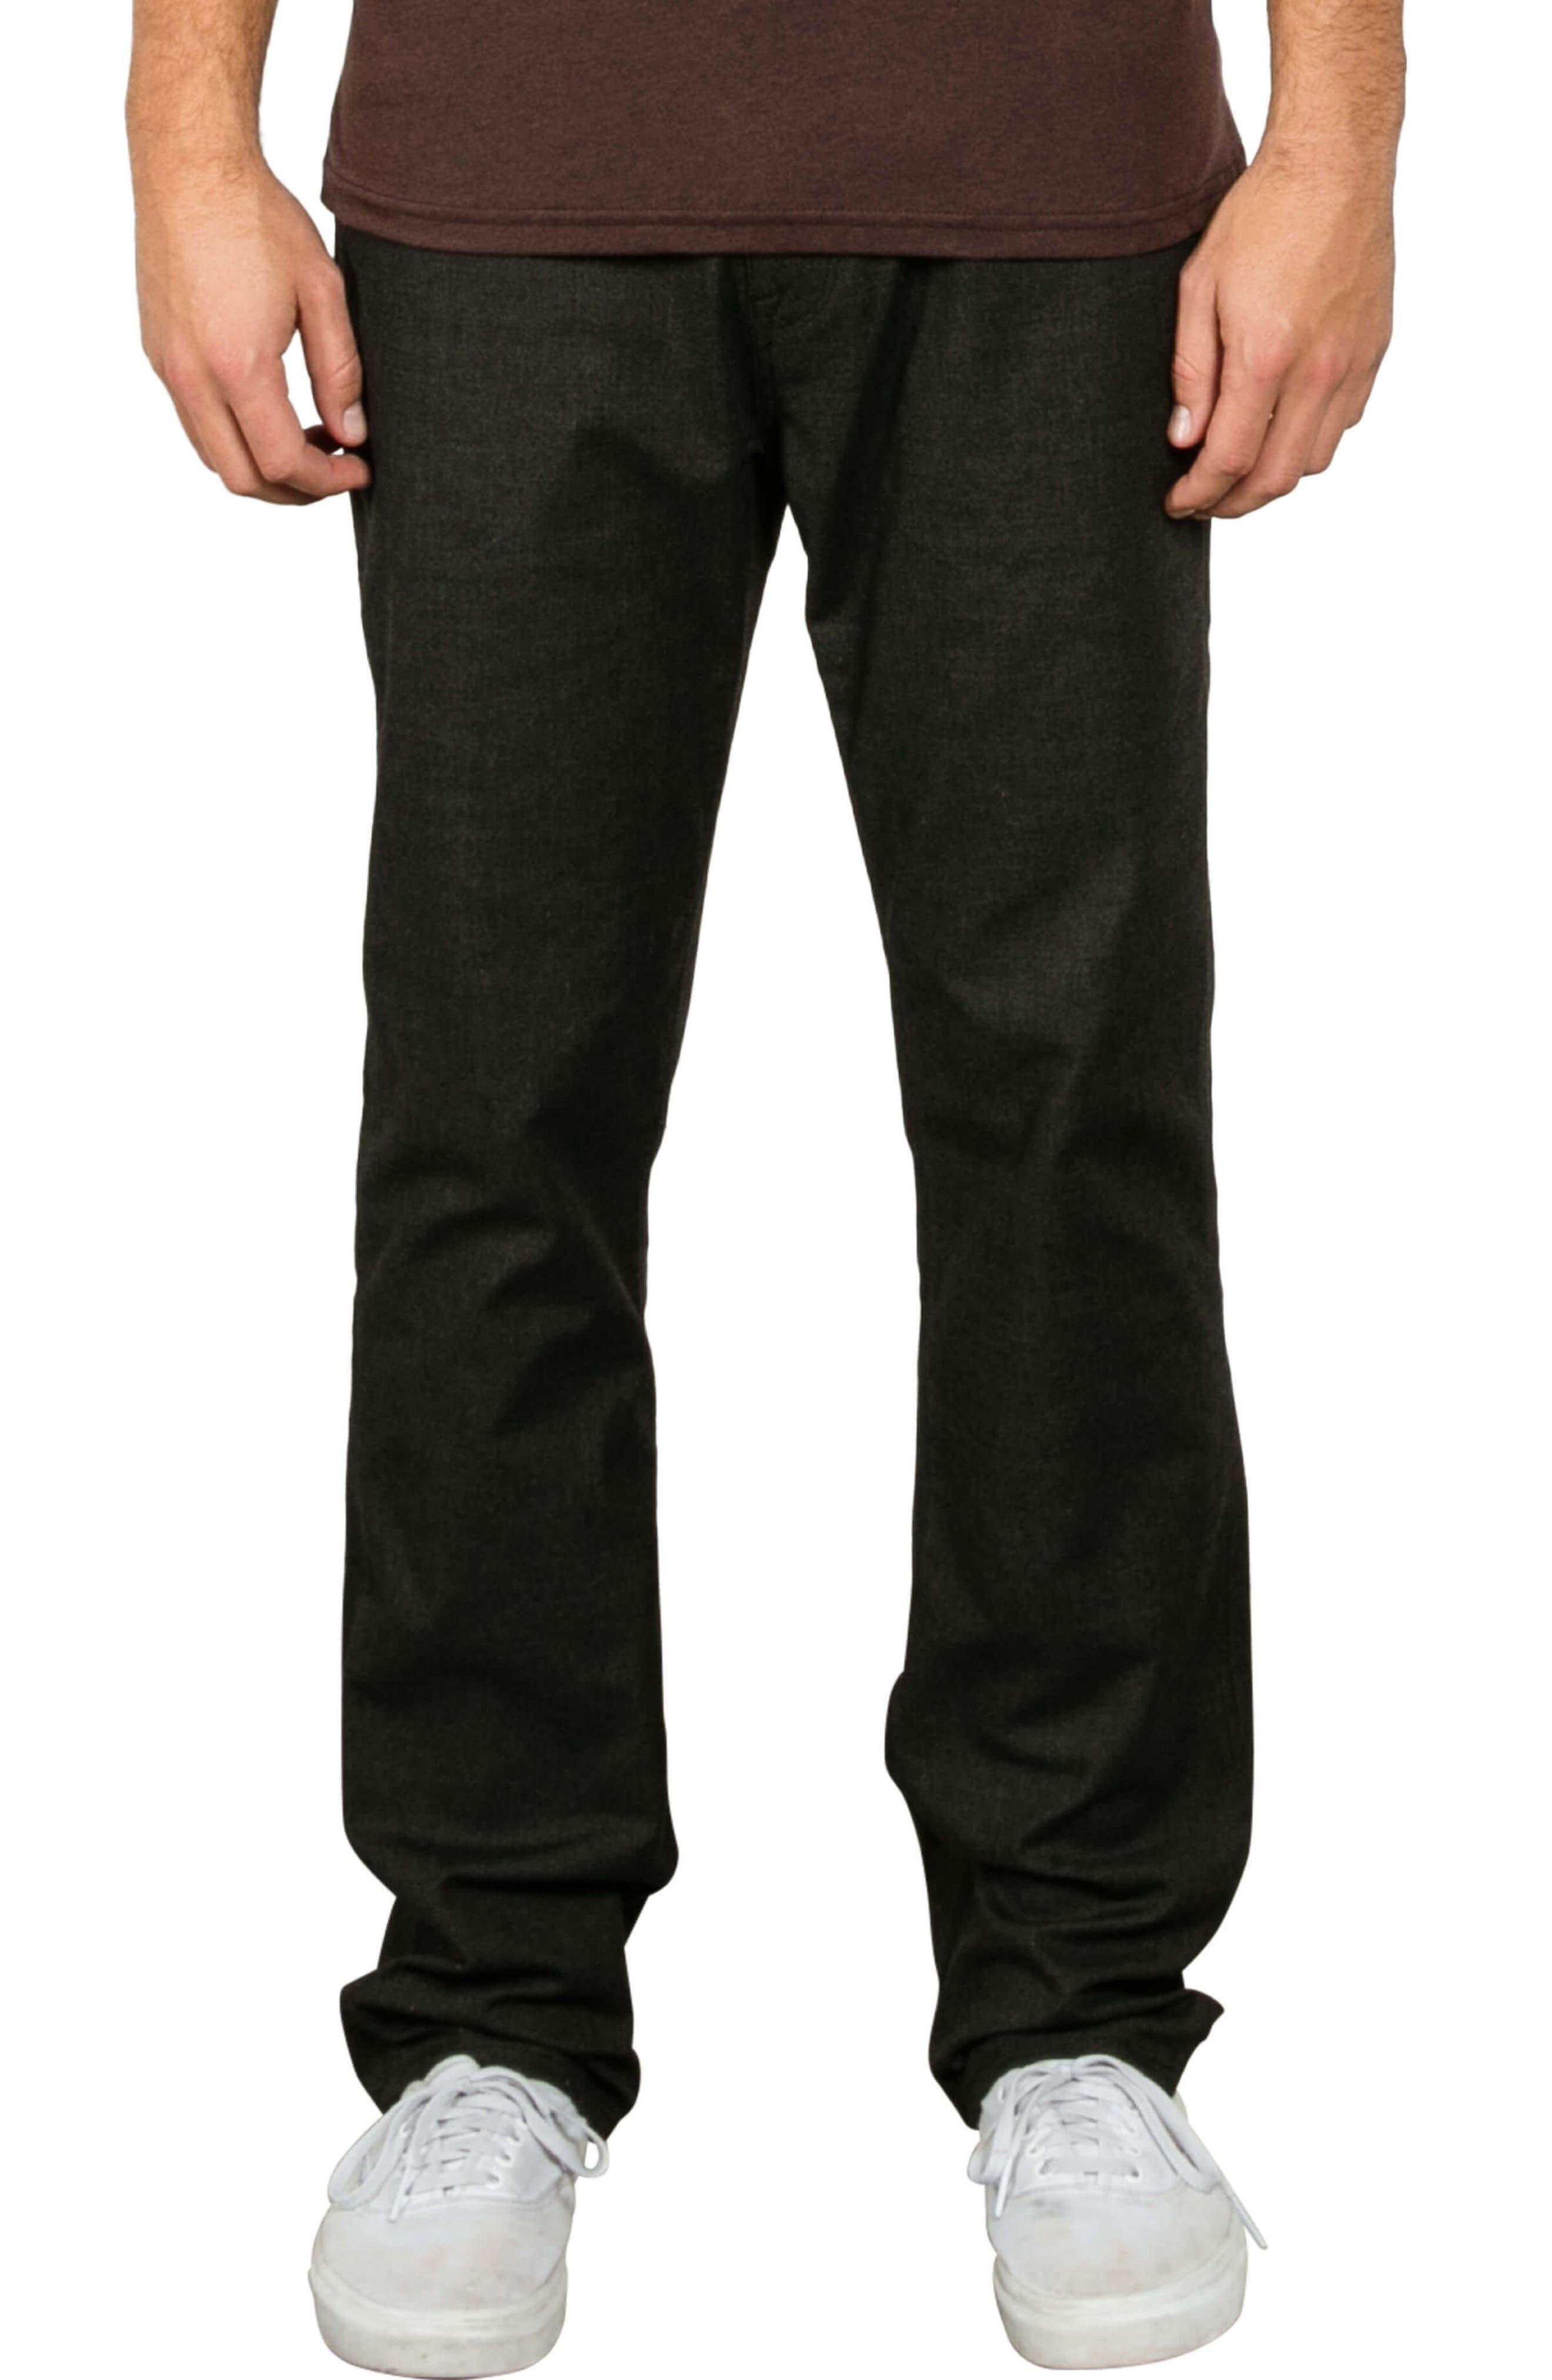 Gritter Modern Thrifter Pants,                         Main,                         color, Grey Metal